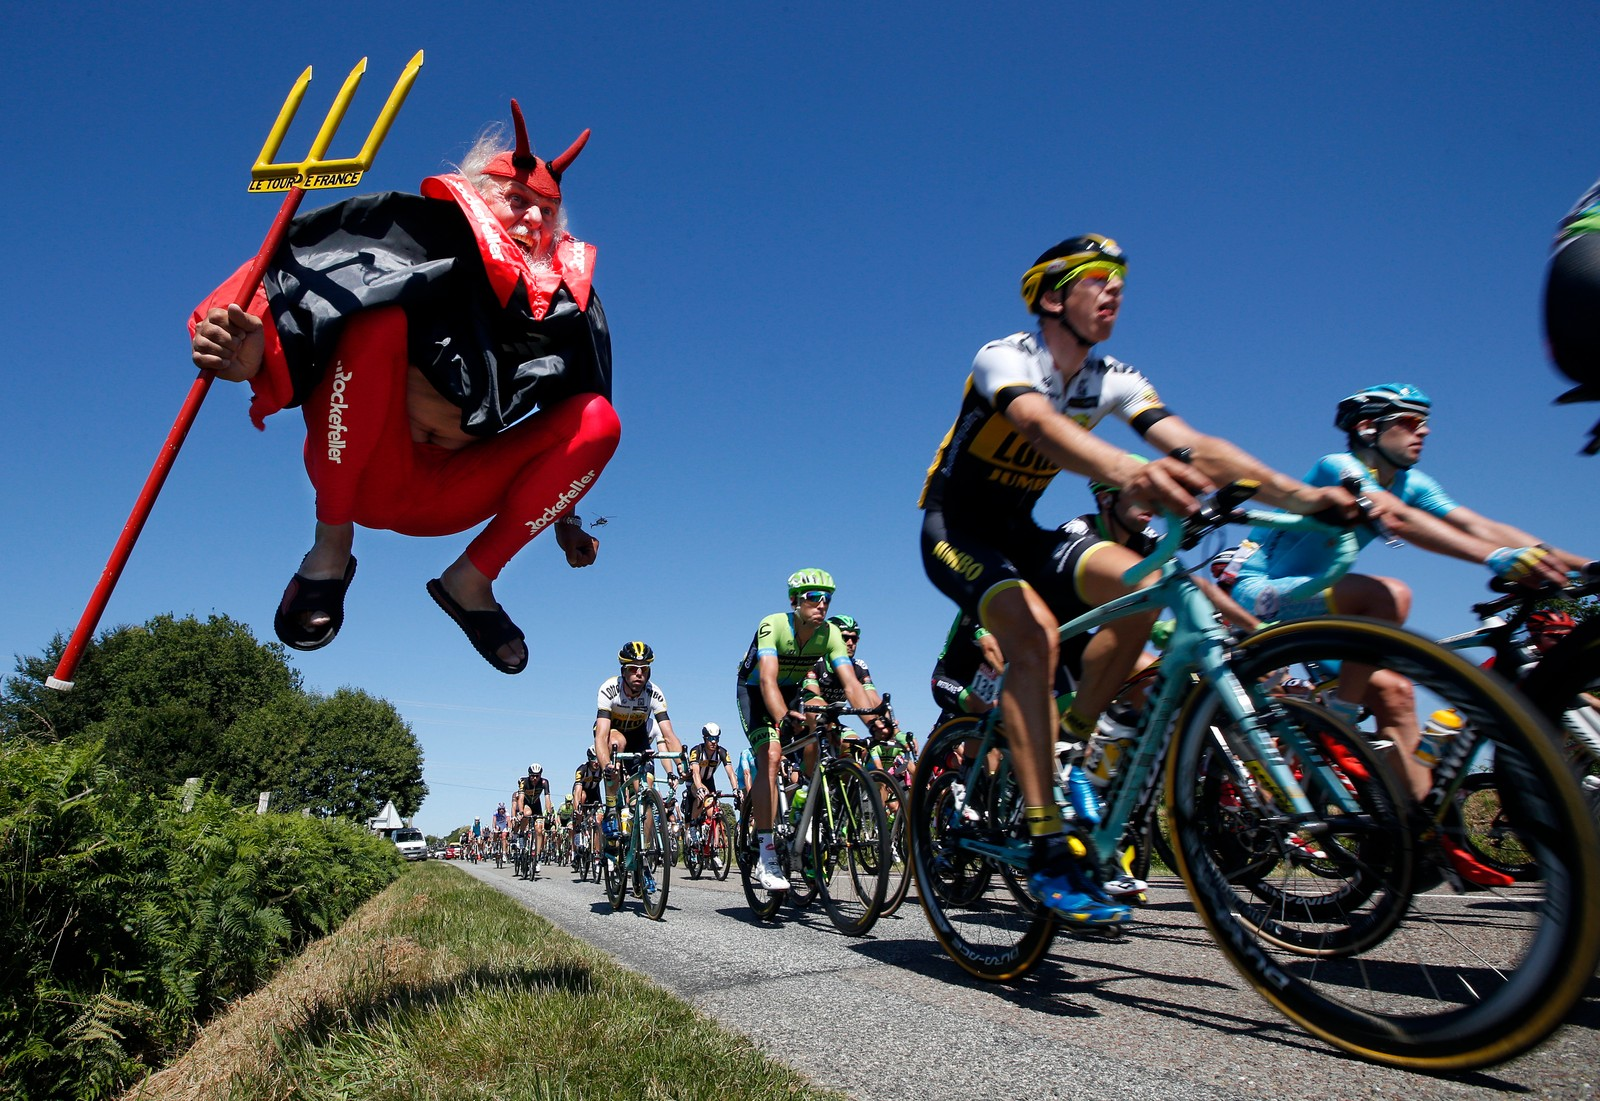 """El Diablo"" er et fast innslag langs løypa under Tour de France."